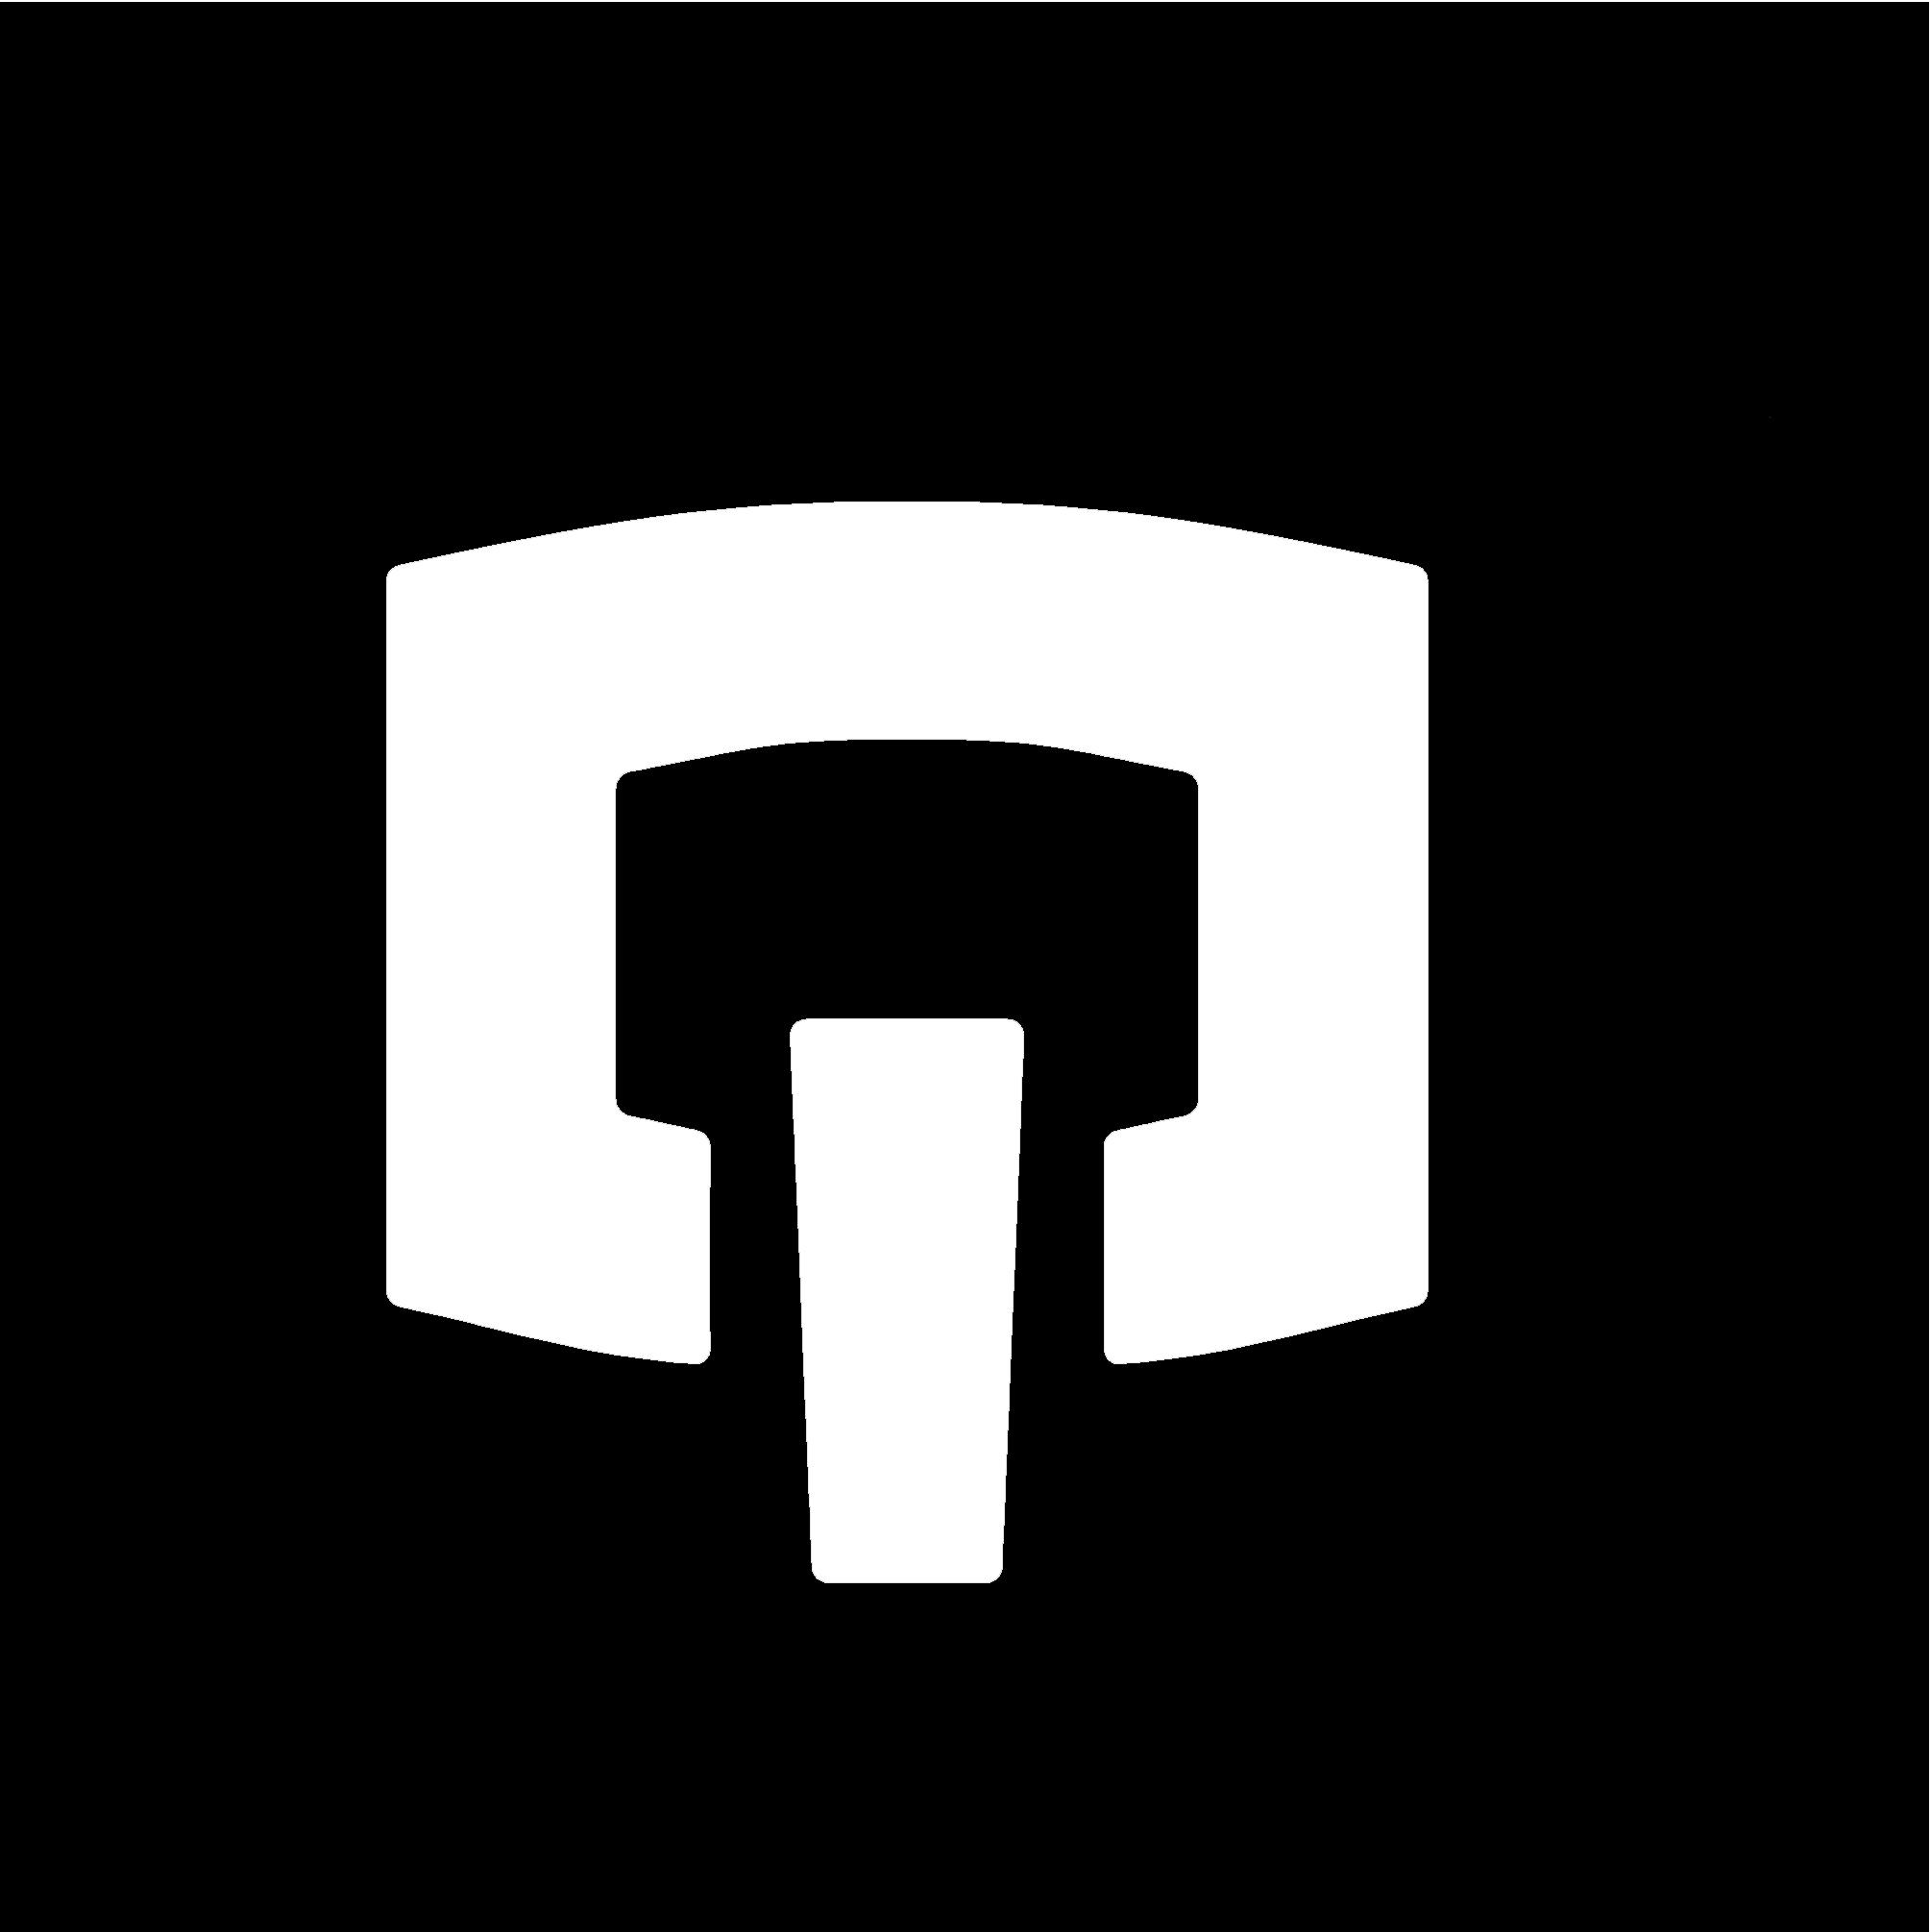 QINT'X Ravenna - Logo